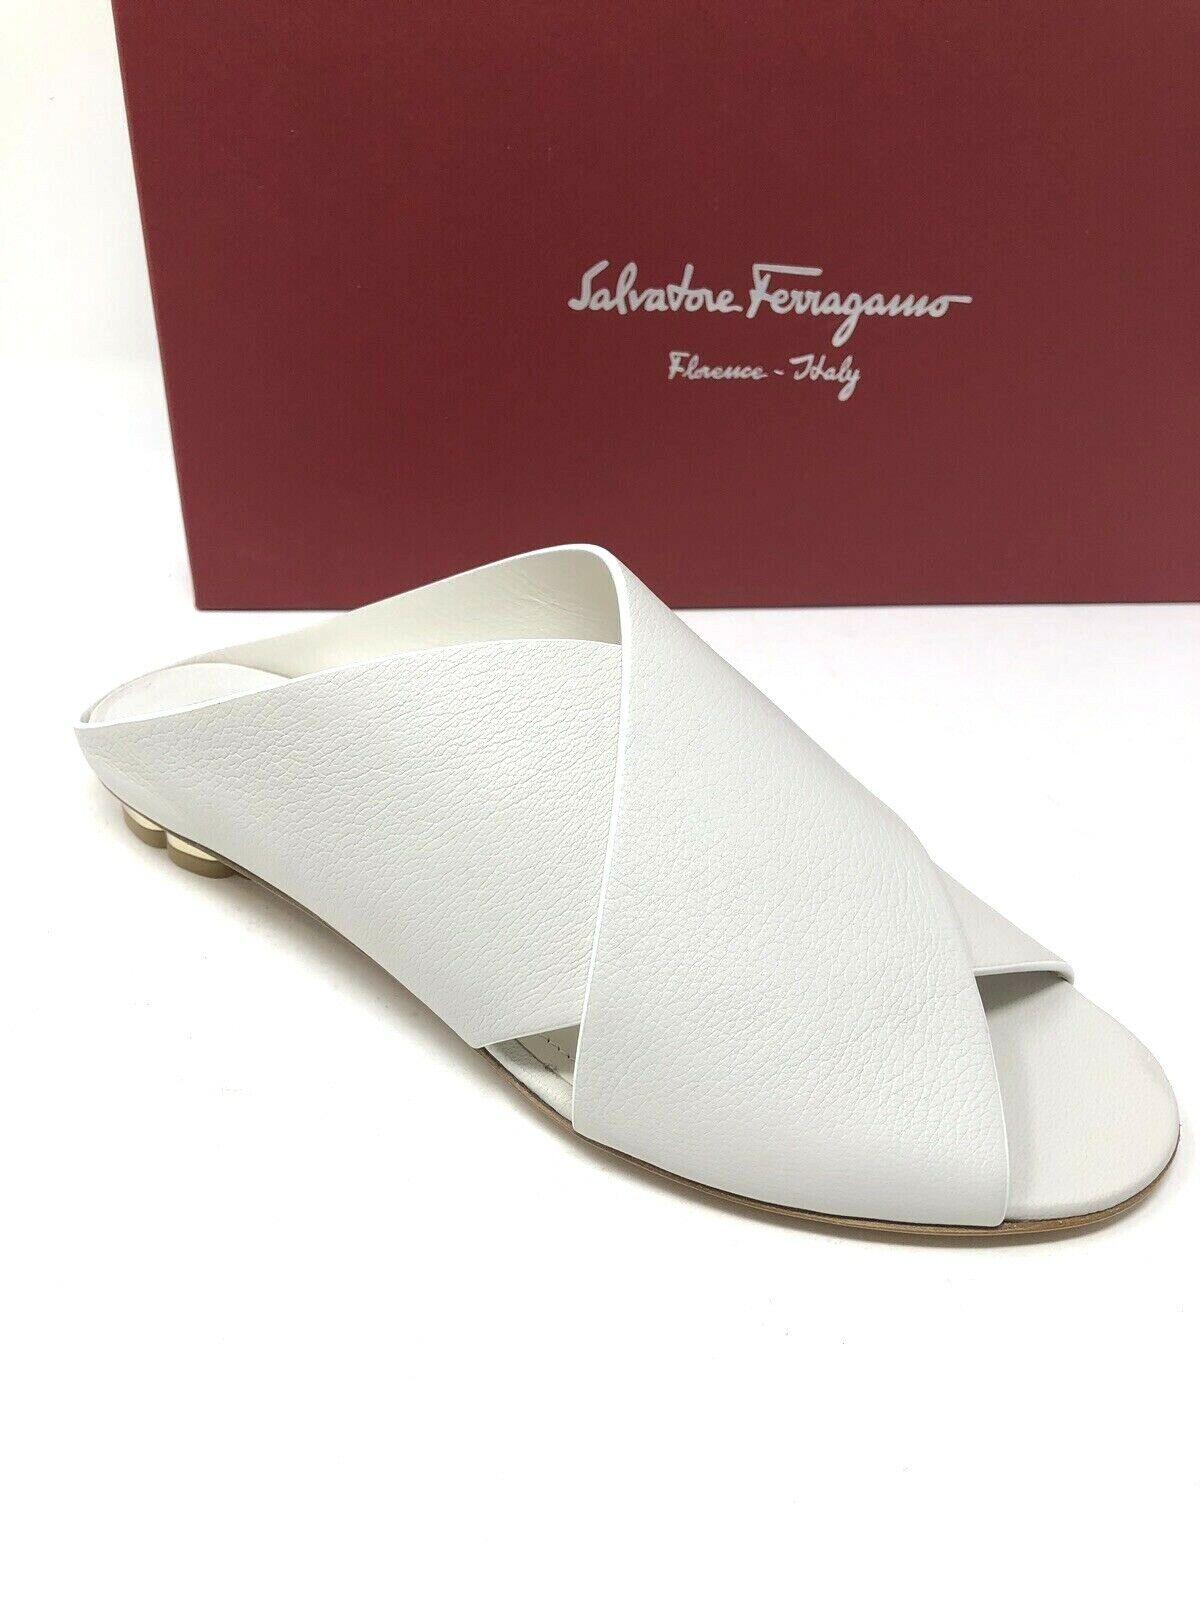 New Salvatore Ferragamo Womens White shoes Slides Ladies Ladies Ladies Sandals Size 6.5 37 b1b8d2